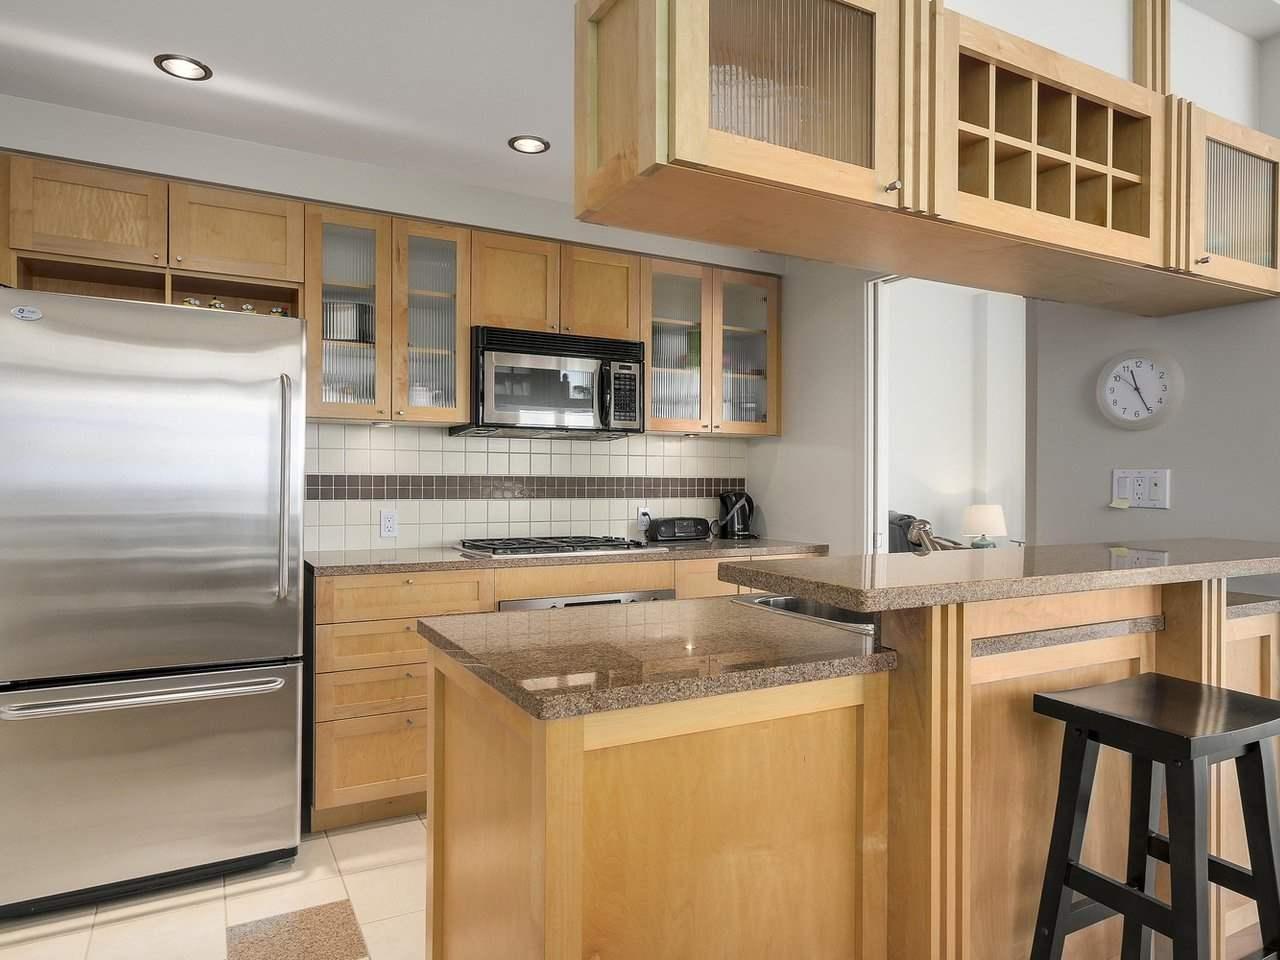 Condo Apartment at 1106 1483 HOMER STREET, Unit 1106, Vancouver West, British Columbia. Image 8